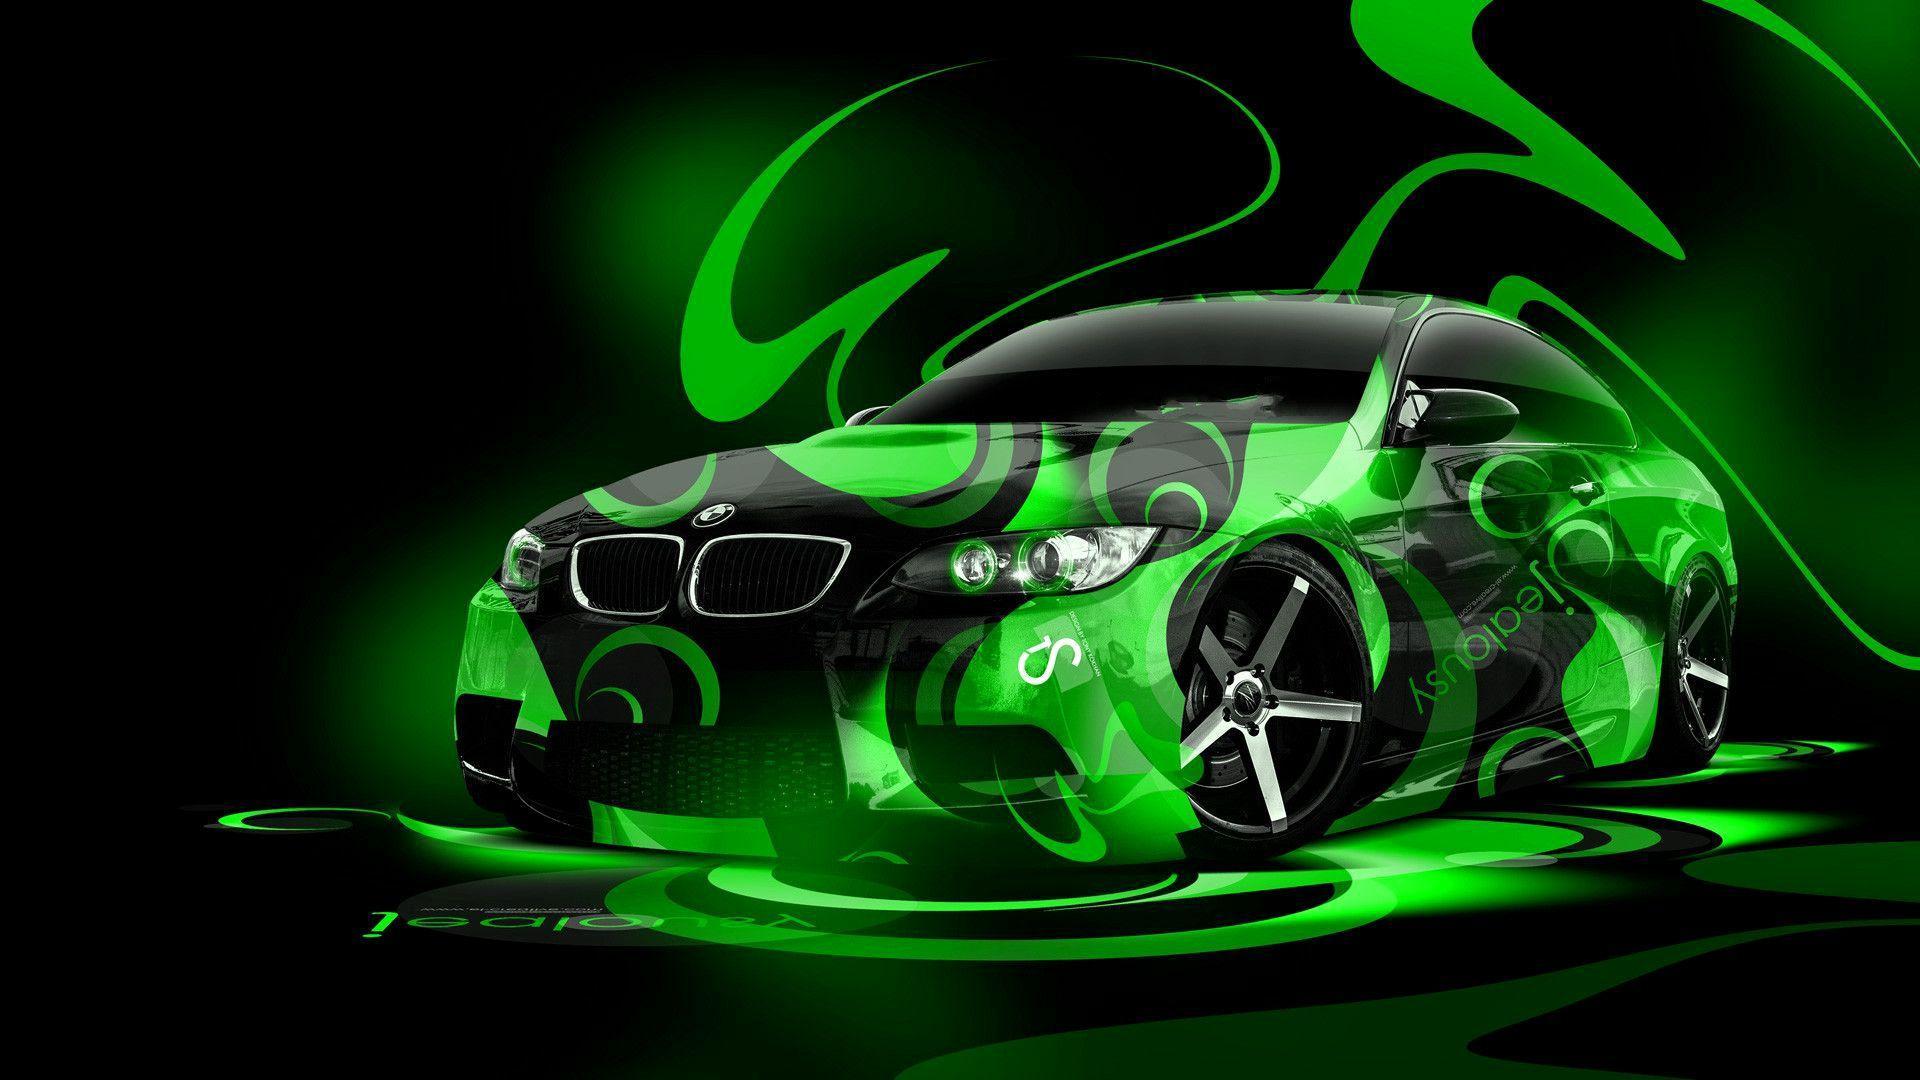 66 Best Free Neon Green Car Wallpapers